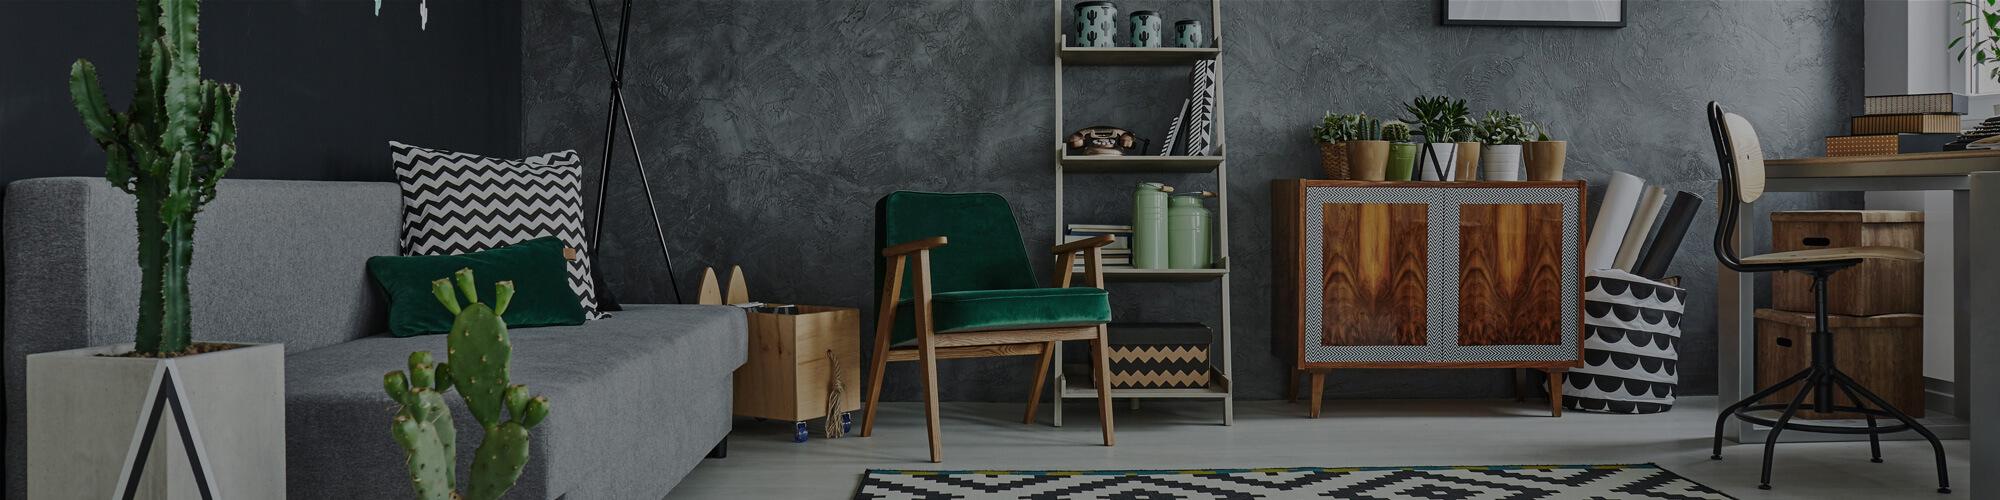 obtenez 5 devis travaux gratuits en 48h etape 1 habitatpresto. Black Bedroom Furniture Sets. Home Design Ideas